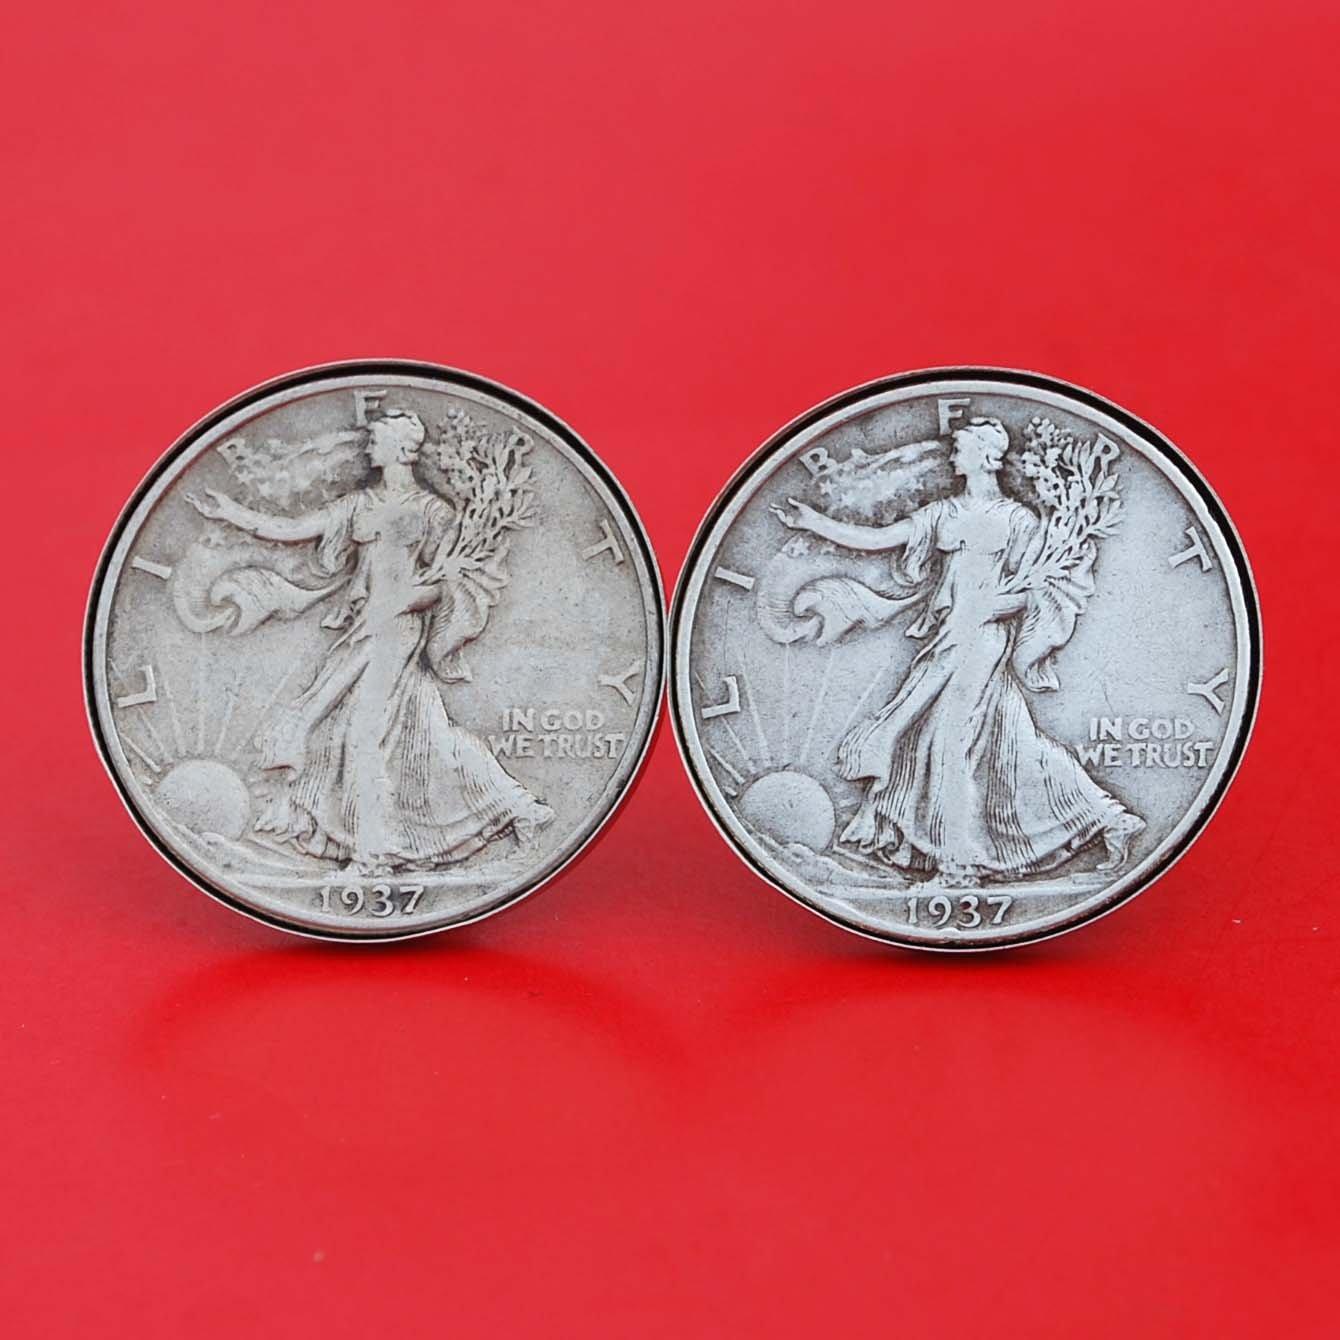 US 1937 Walking Liberty Half Coin Dollar Silver Max 64% OFF sale 90% Cuffl